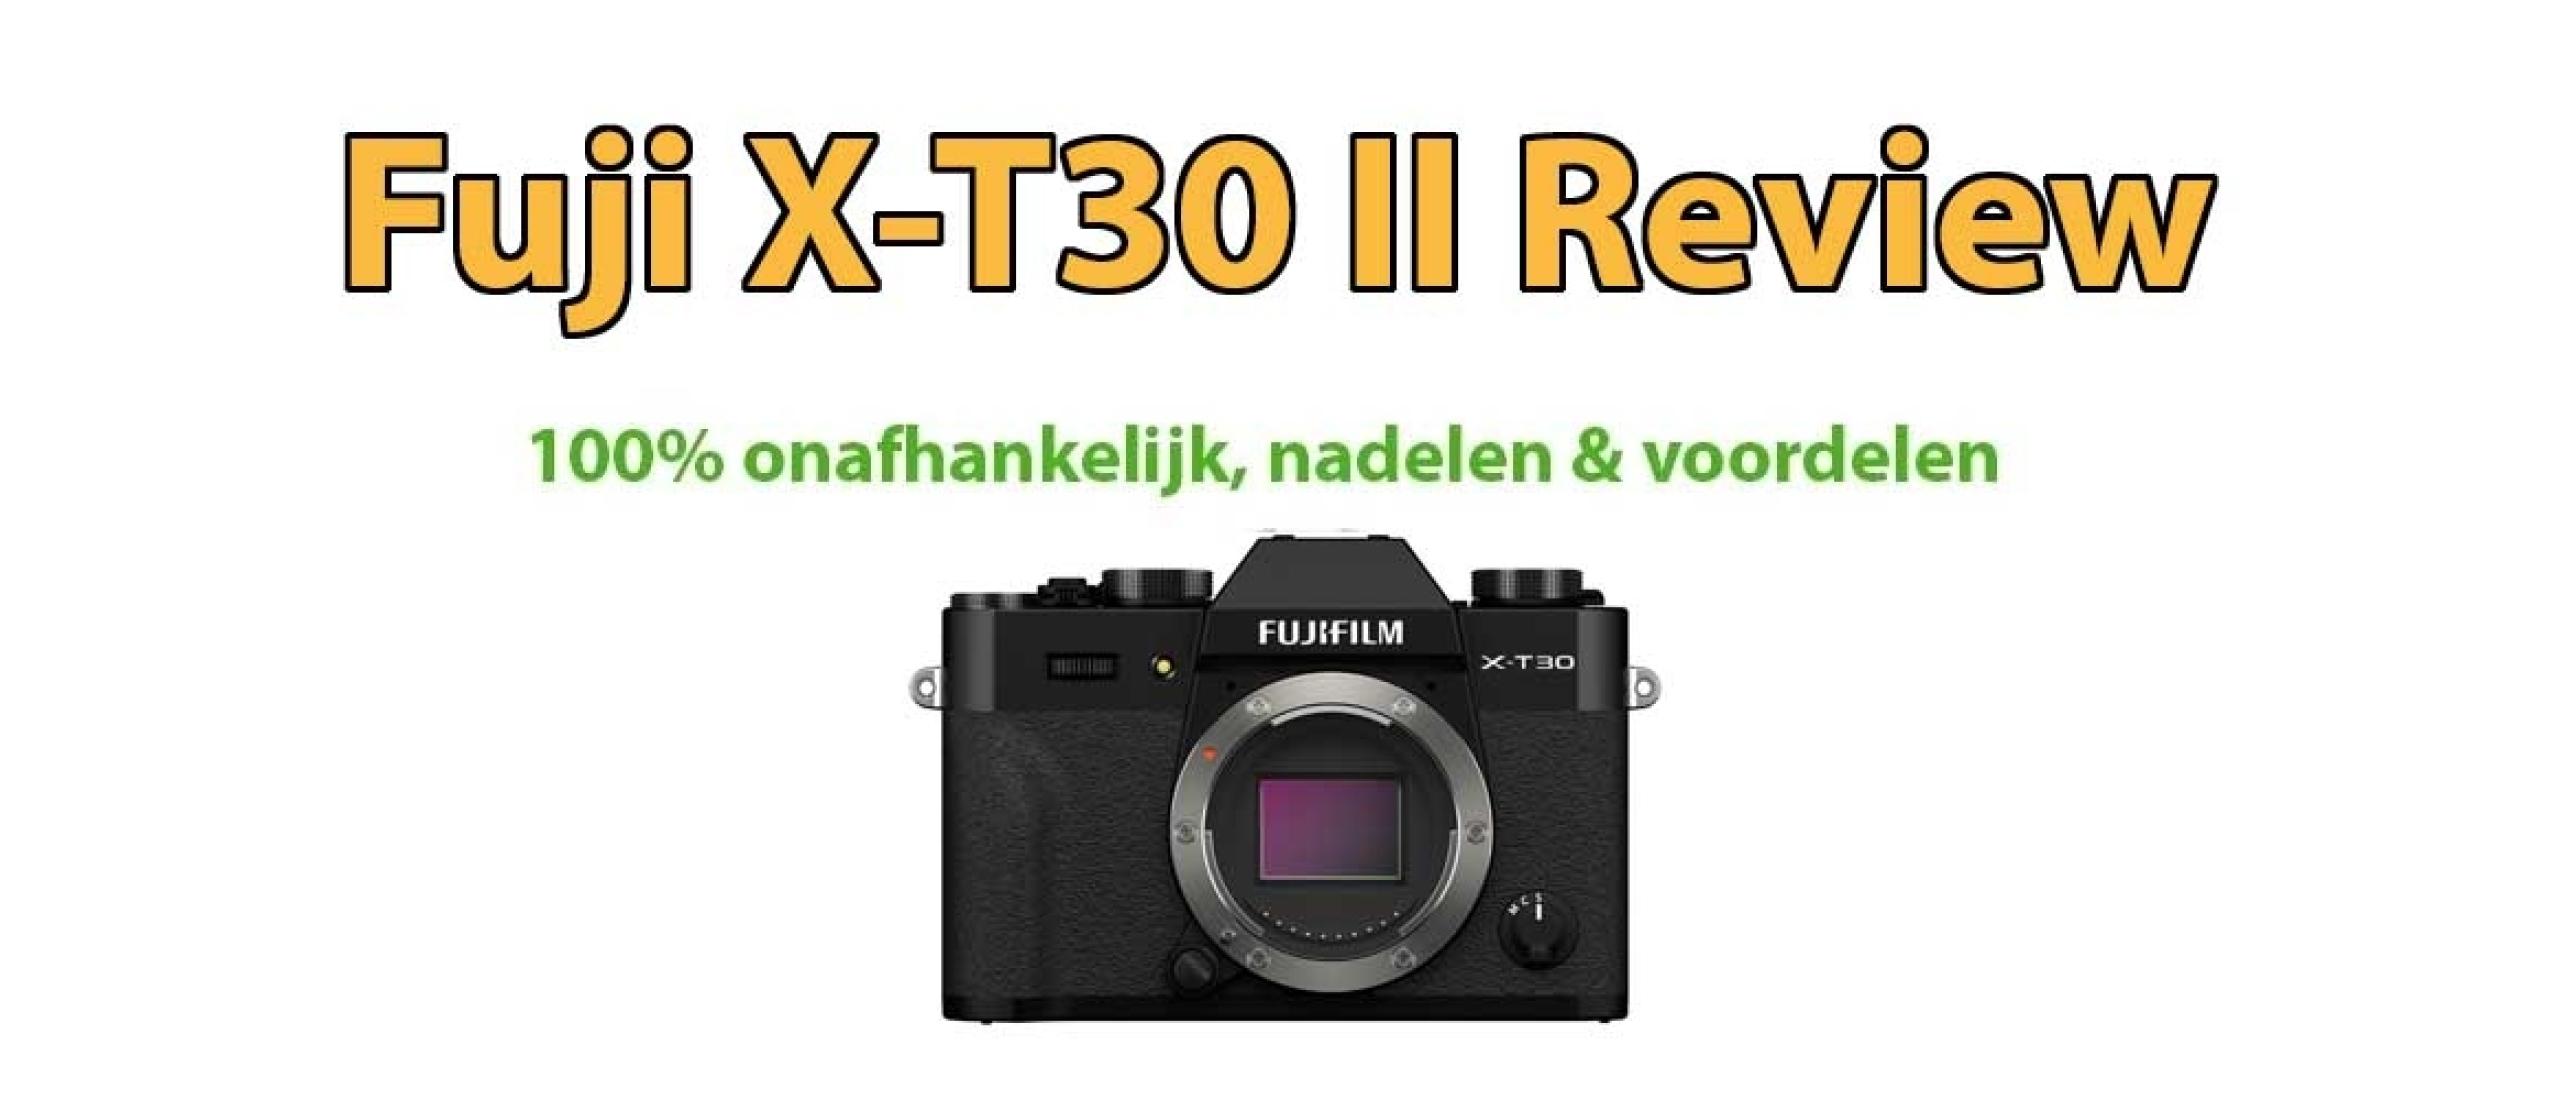 Fujifilm X-T30 II systeemcamera Review